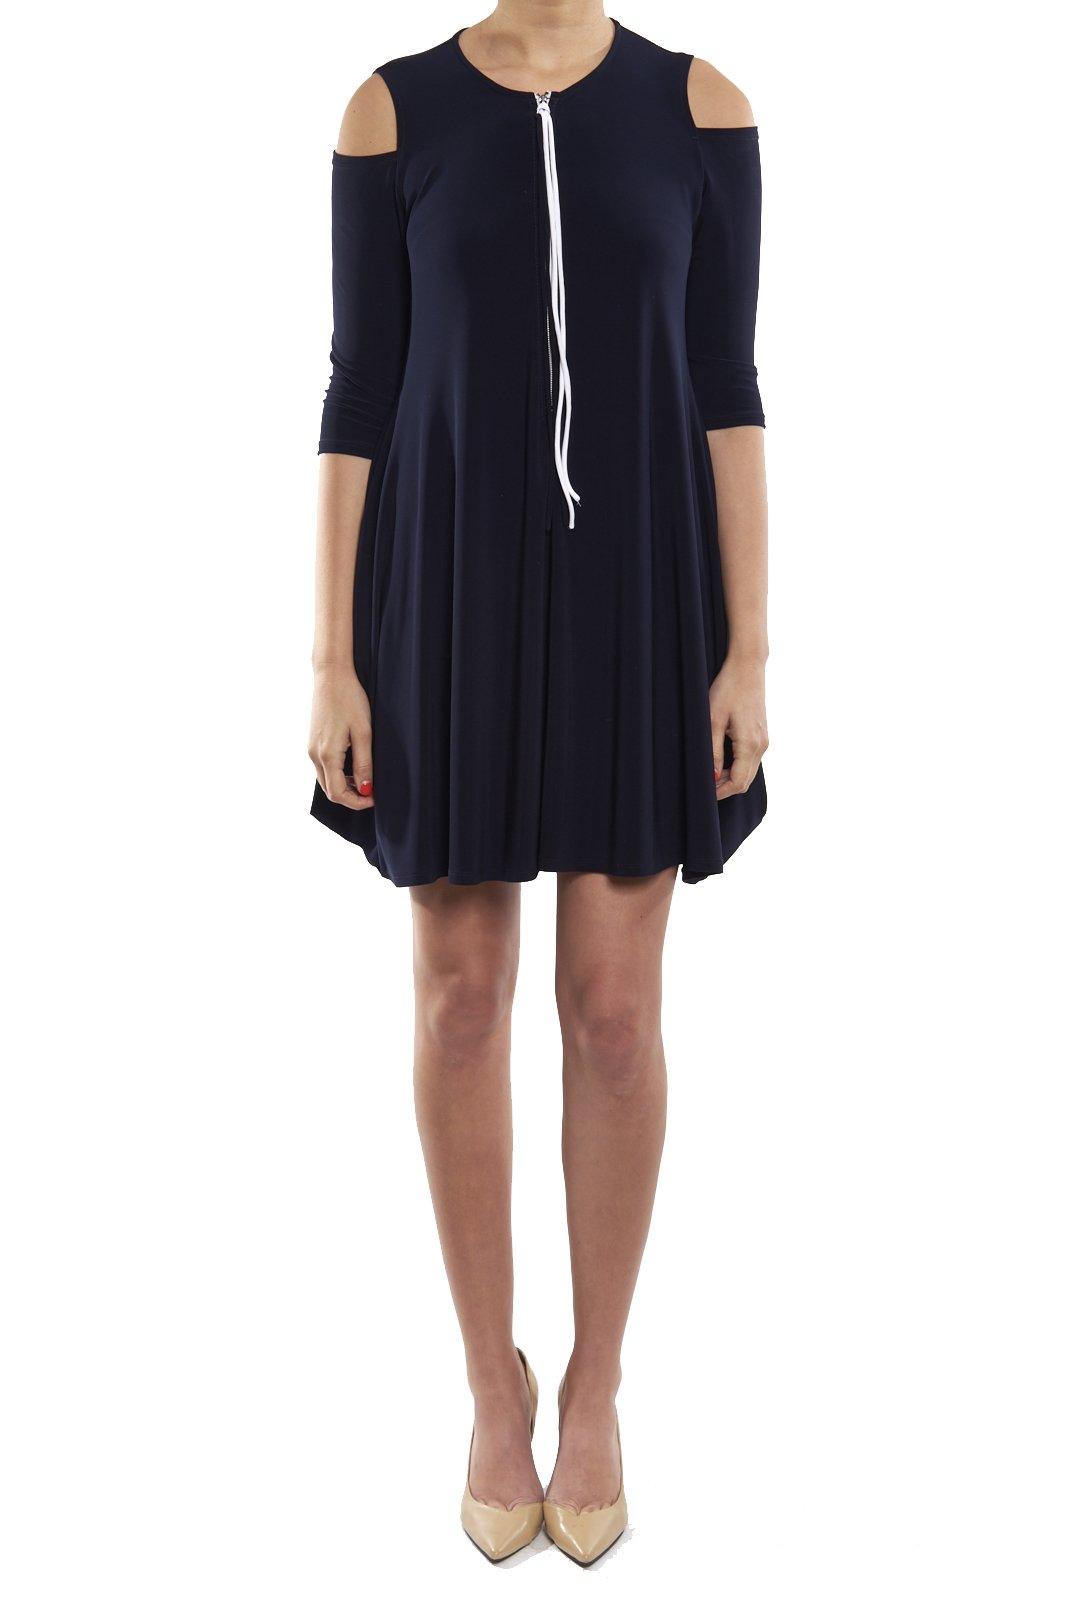 Joseph Ribkoff Spring 2018 Dress Style 181052